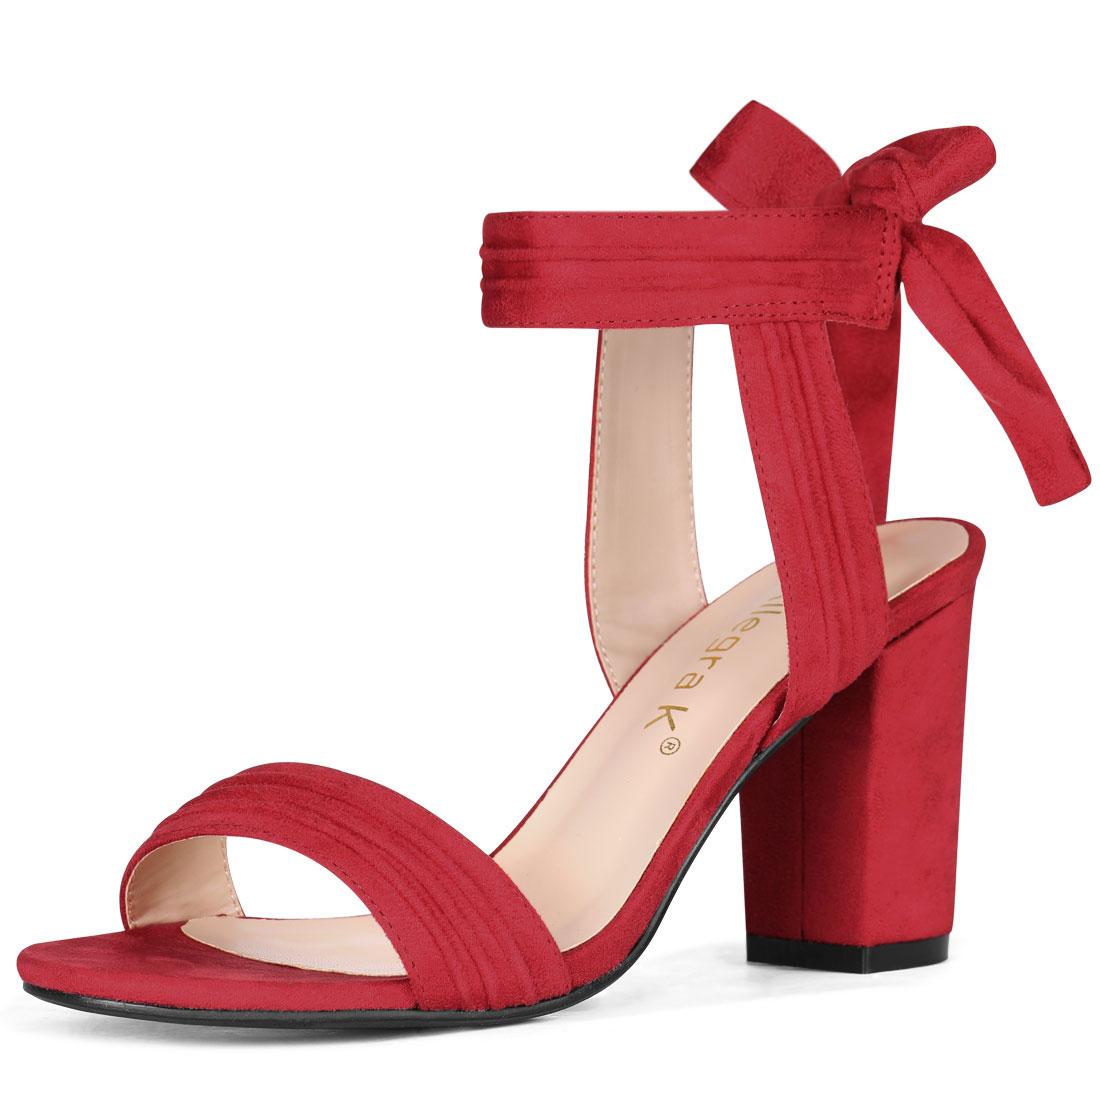 Allegra K Women's Open Toe Ankle Tie Back Chunky Heel Sandals Red US 7